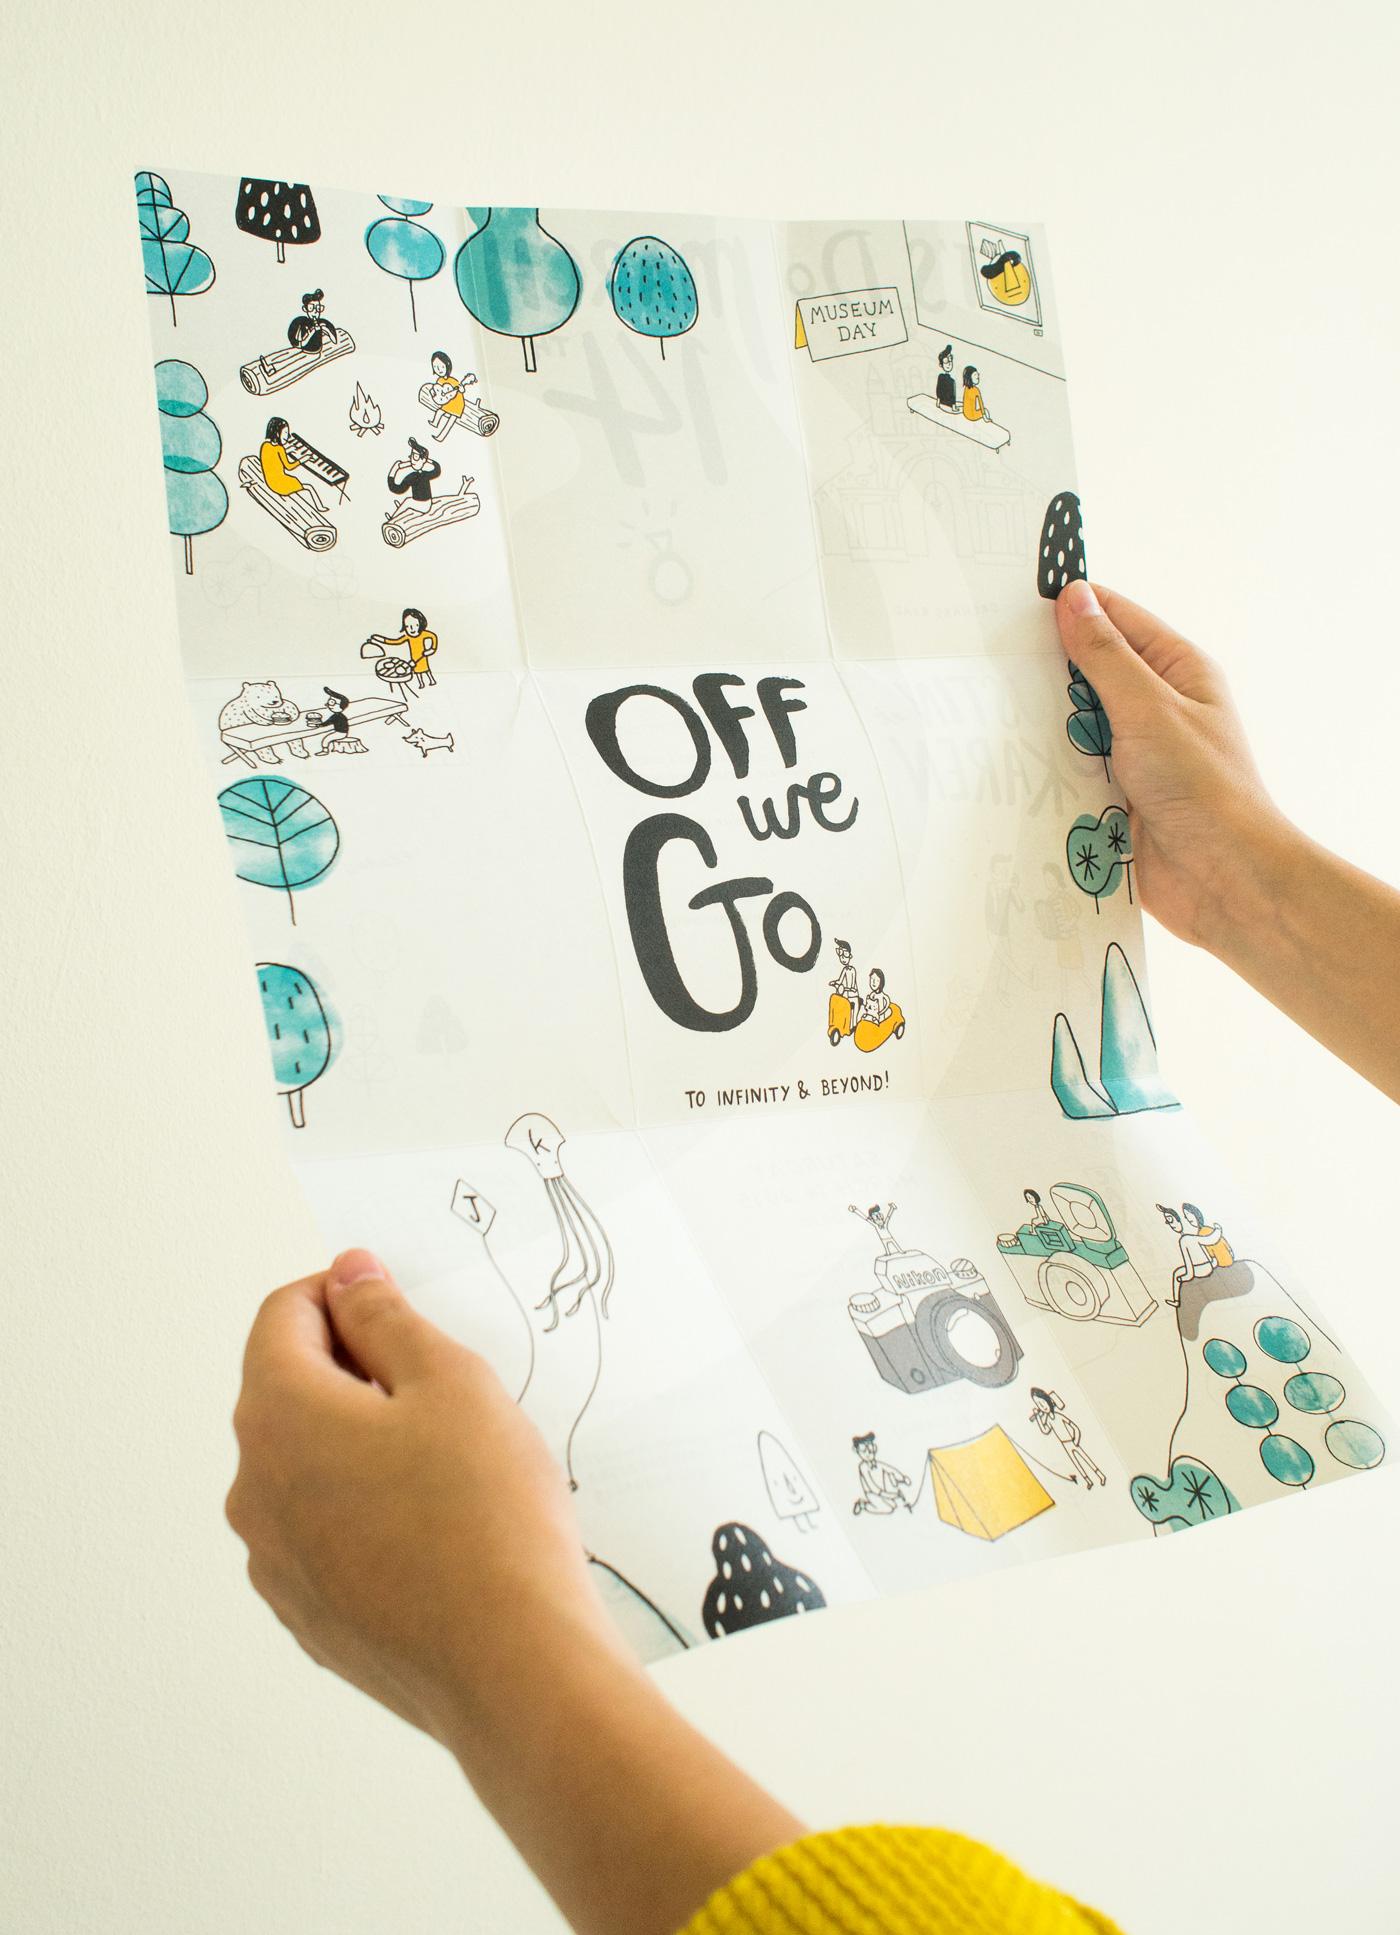 Off-we-go-poster-1.jpg